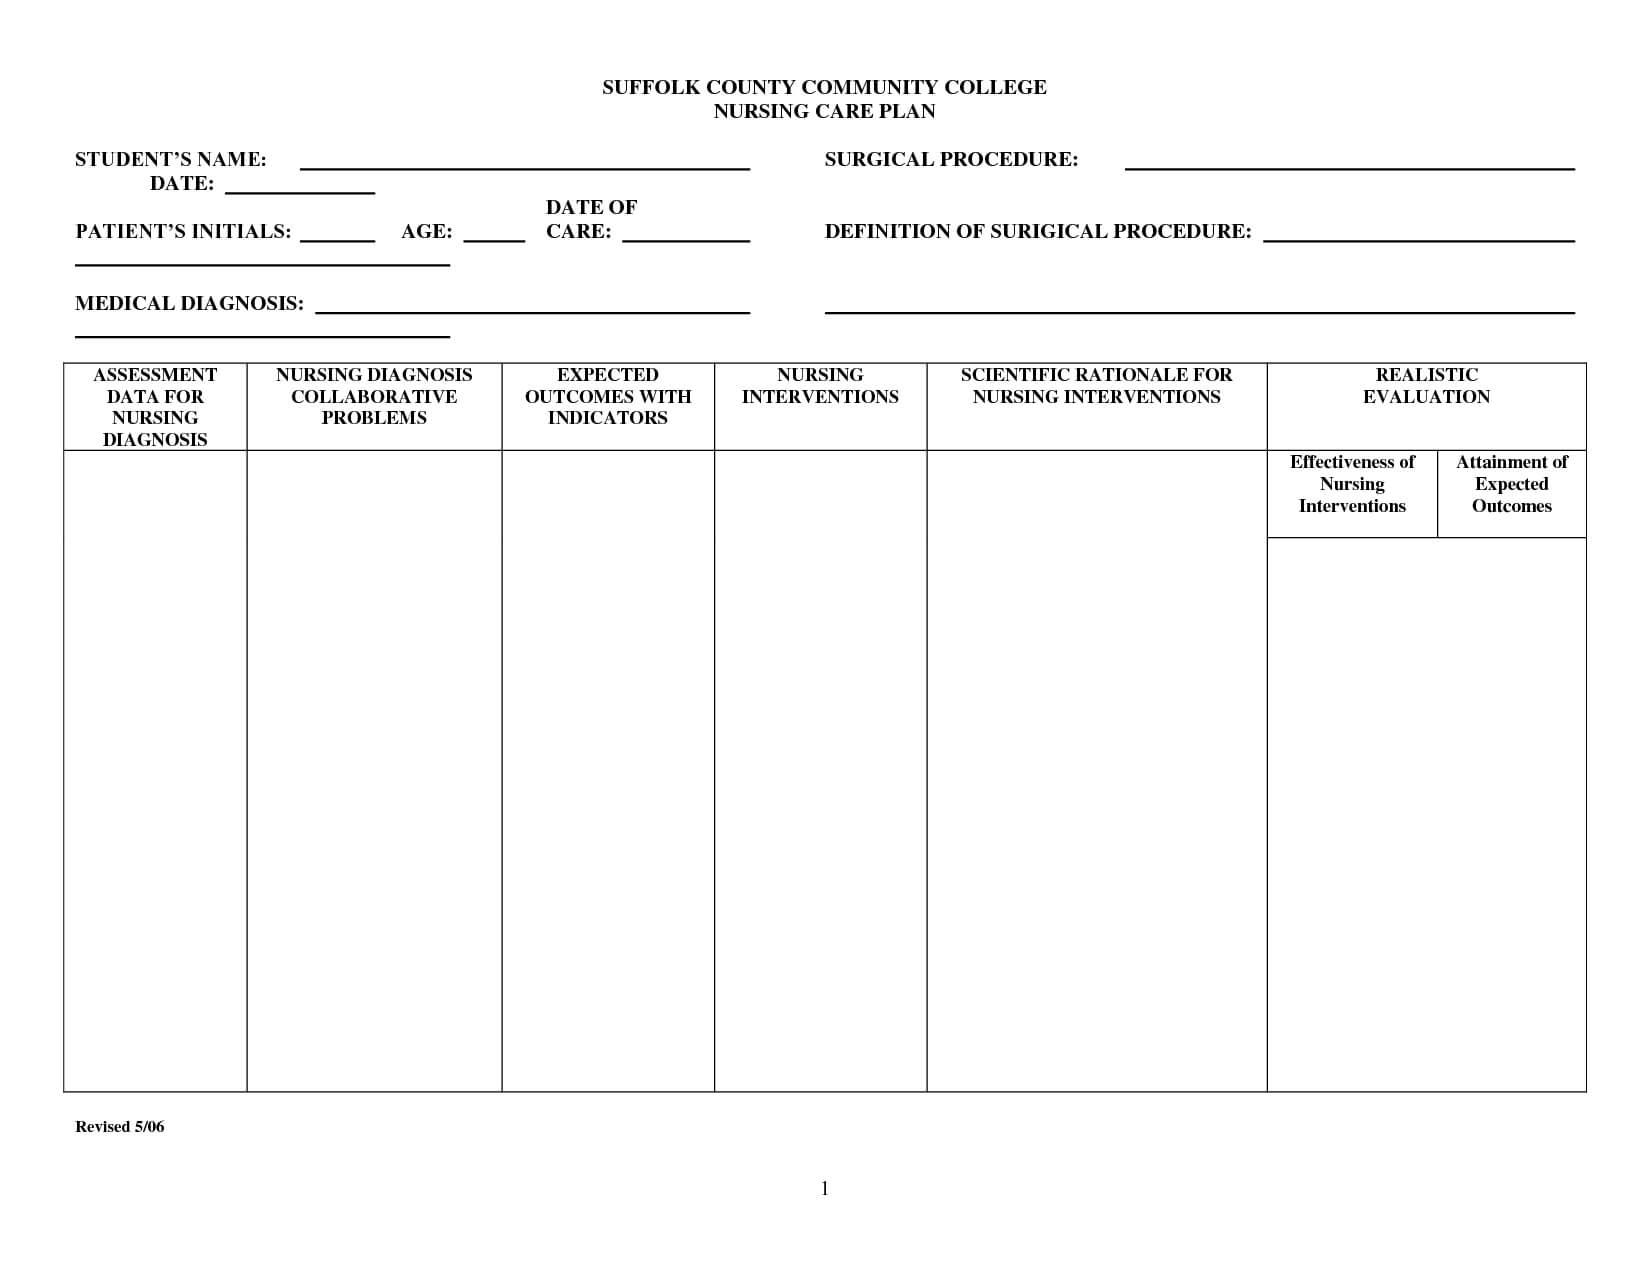 Image Result For Plan Notification | Nursing Care Plan In Nursing Care Plan Template Word